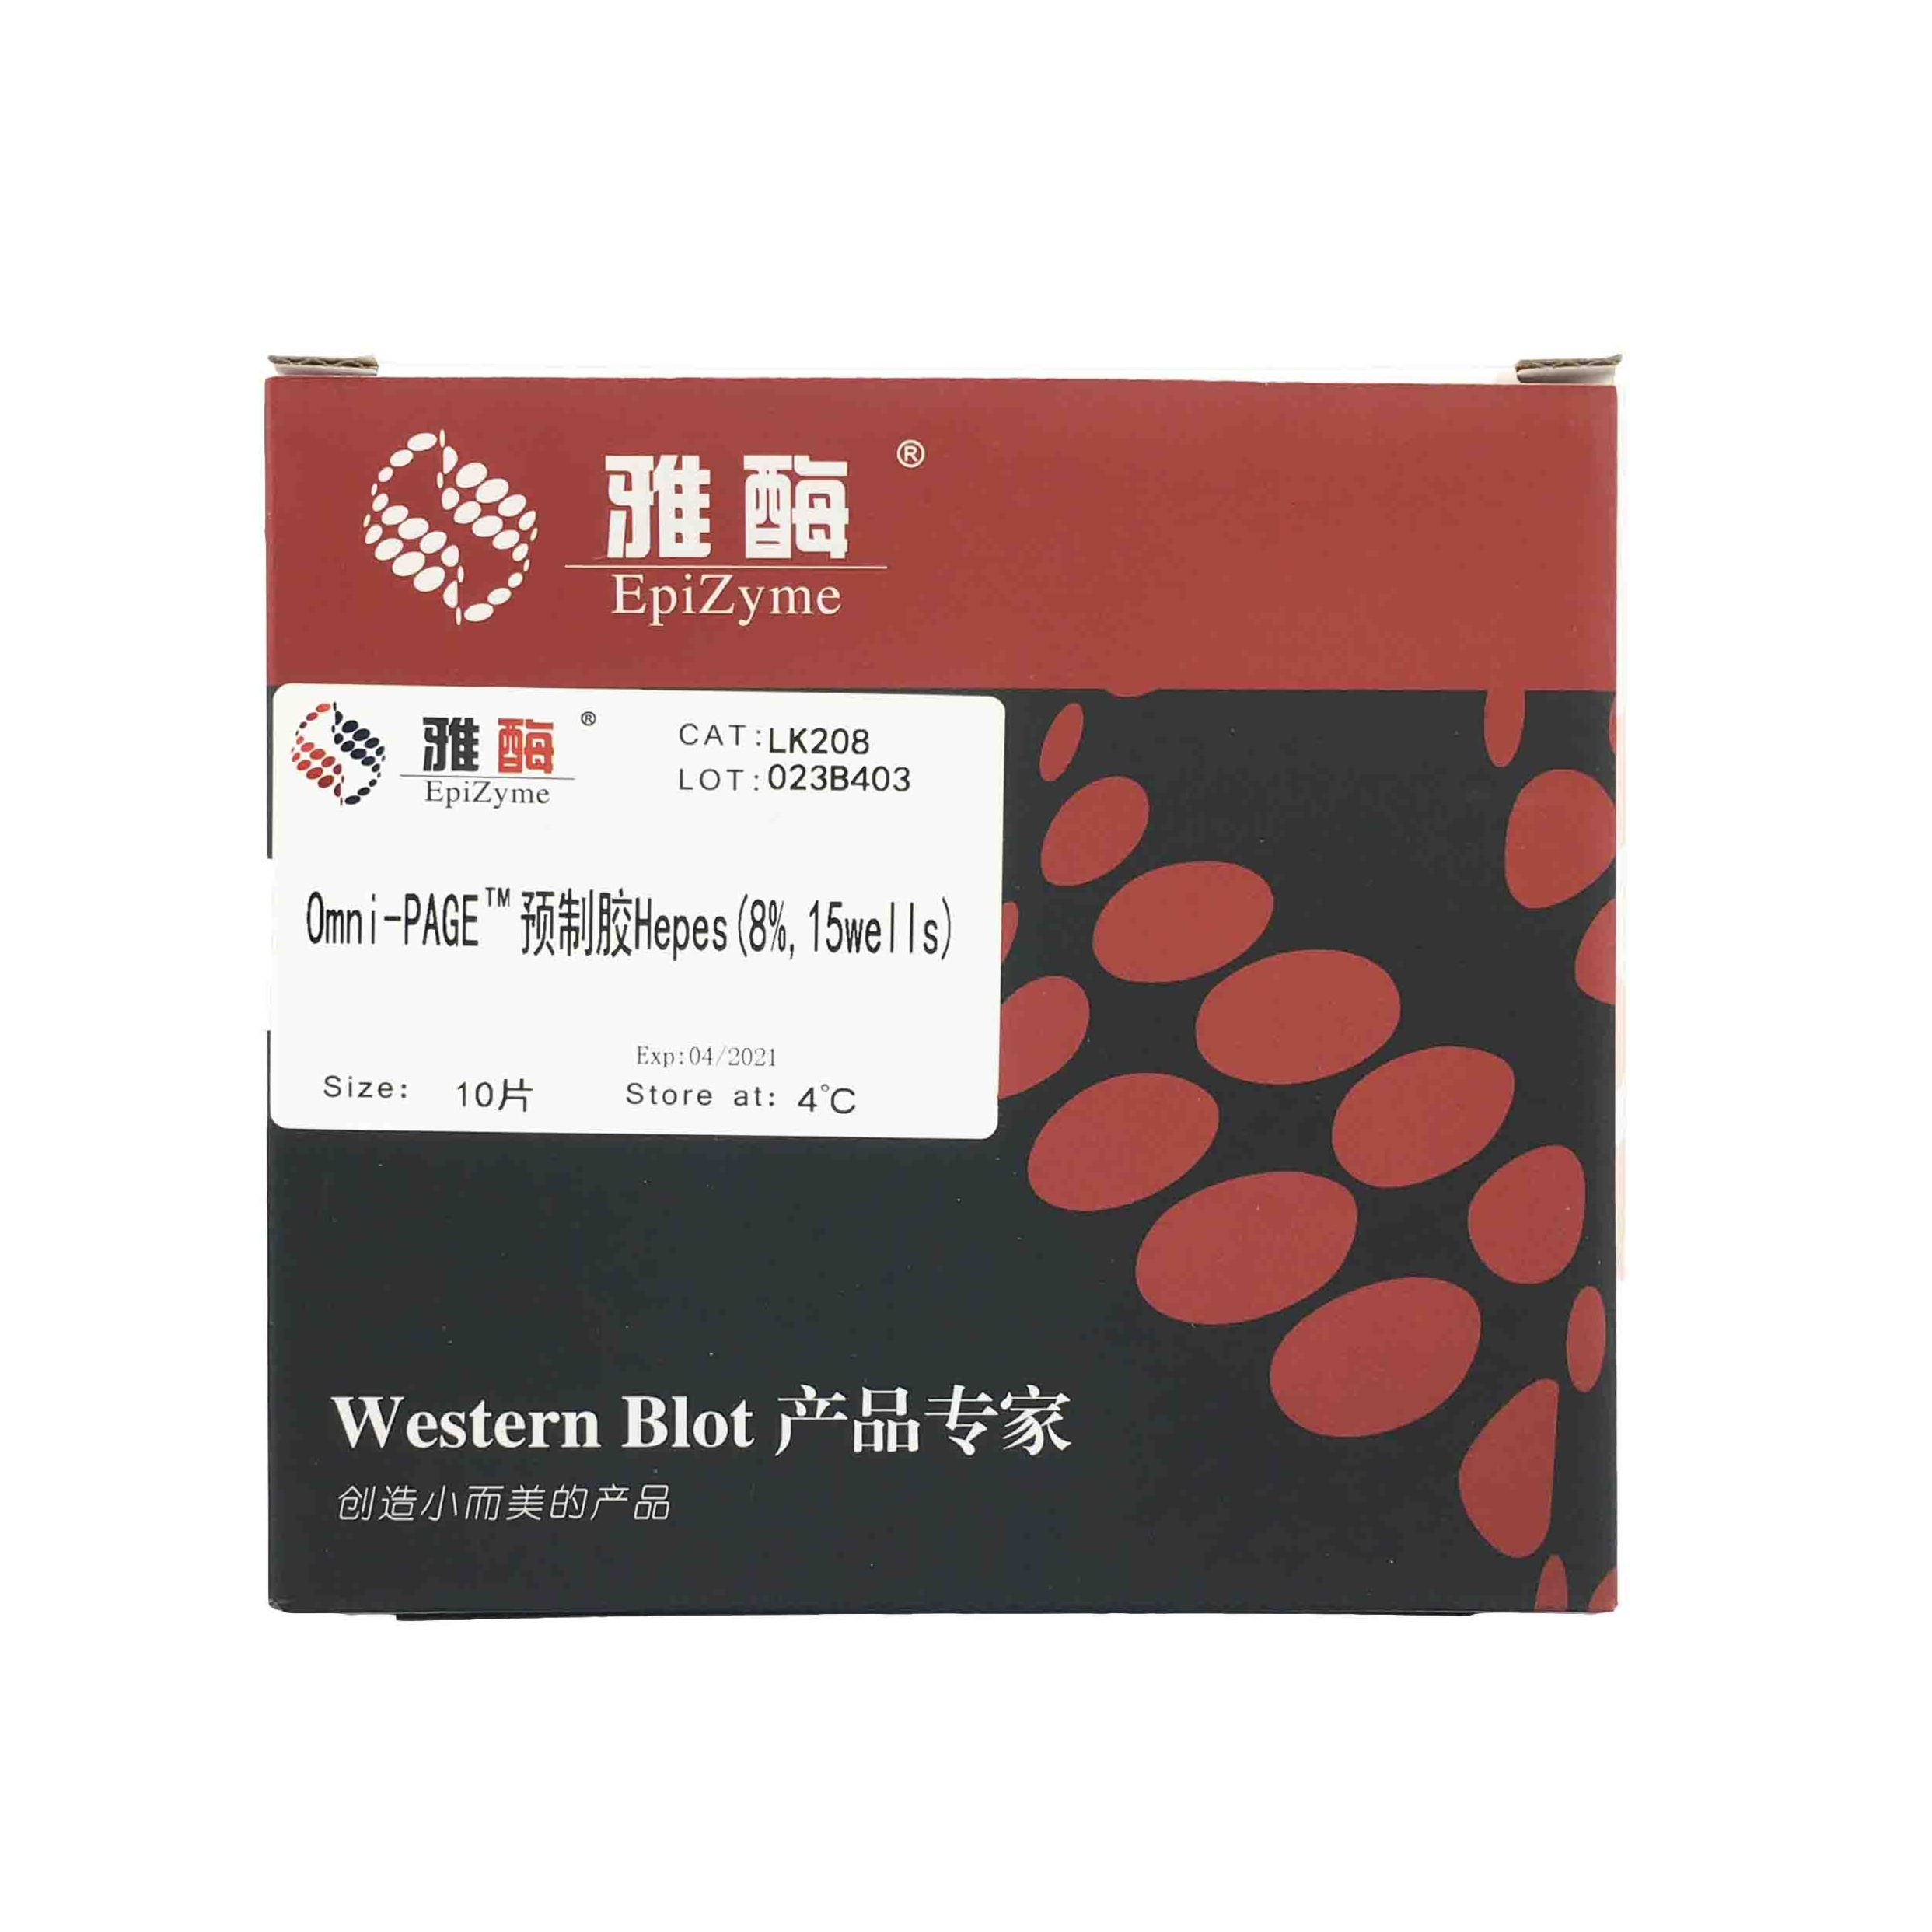 LK208 Omni-PAGE™ 预制胶 Hepes 8%,15 wells